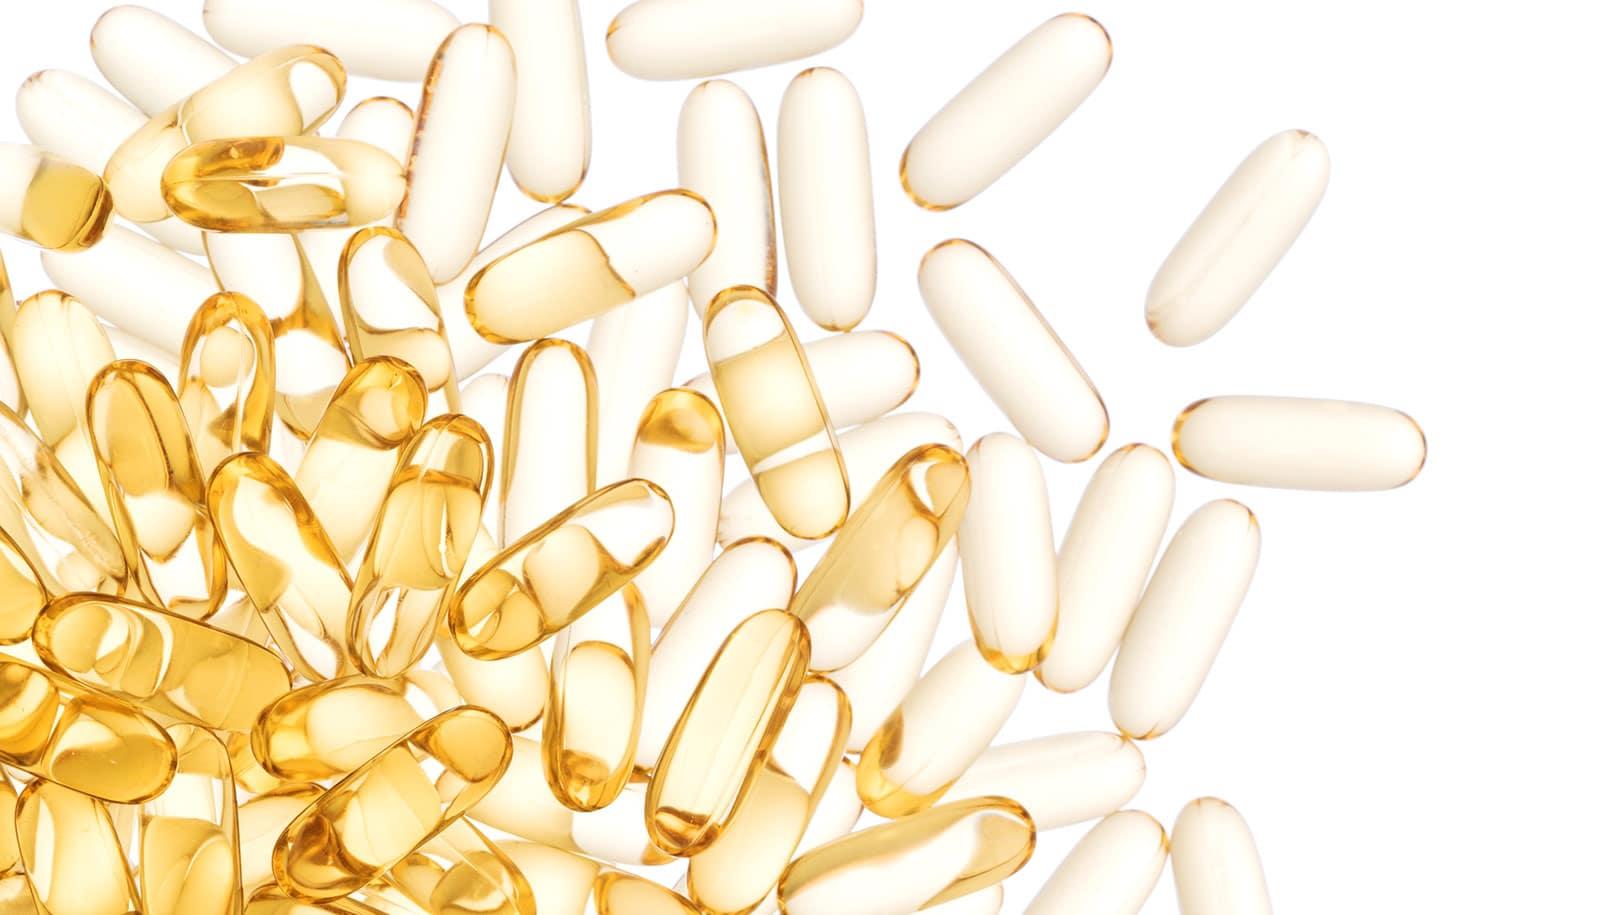 Prescription omega 3s keep triglycerides in check